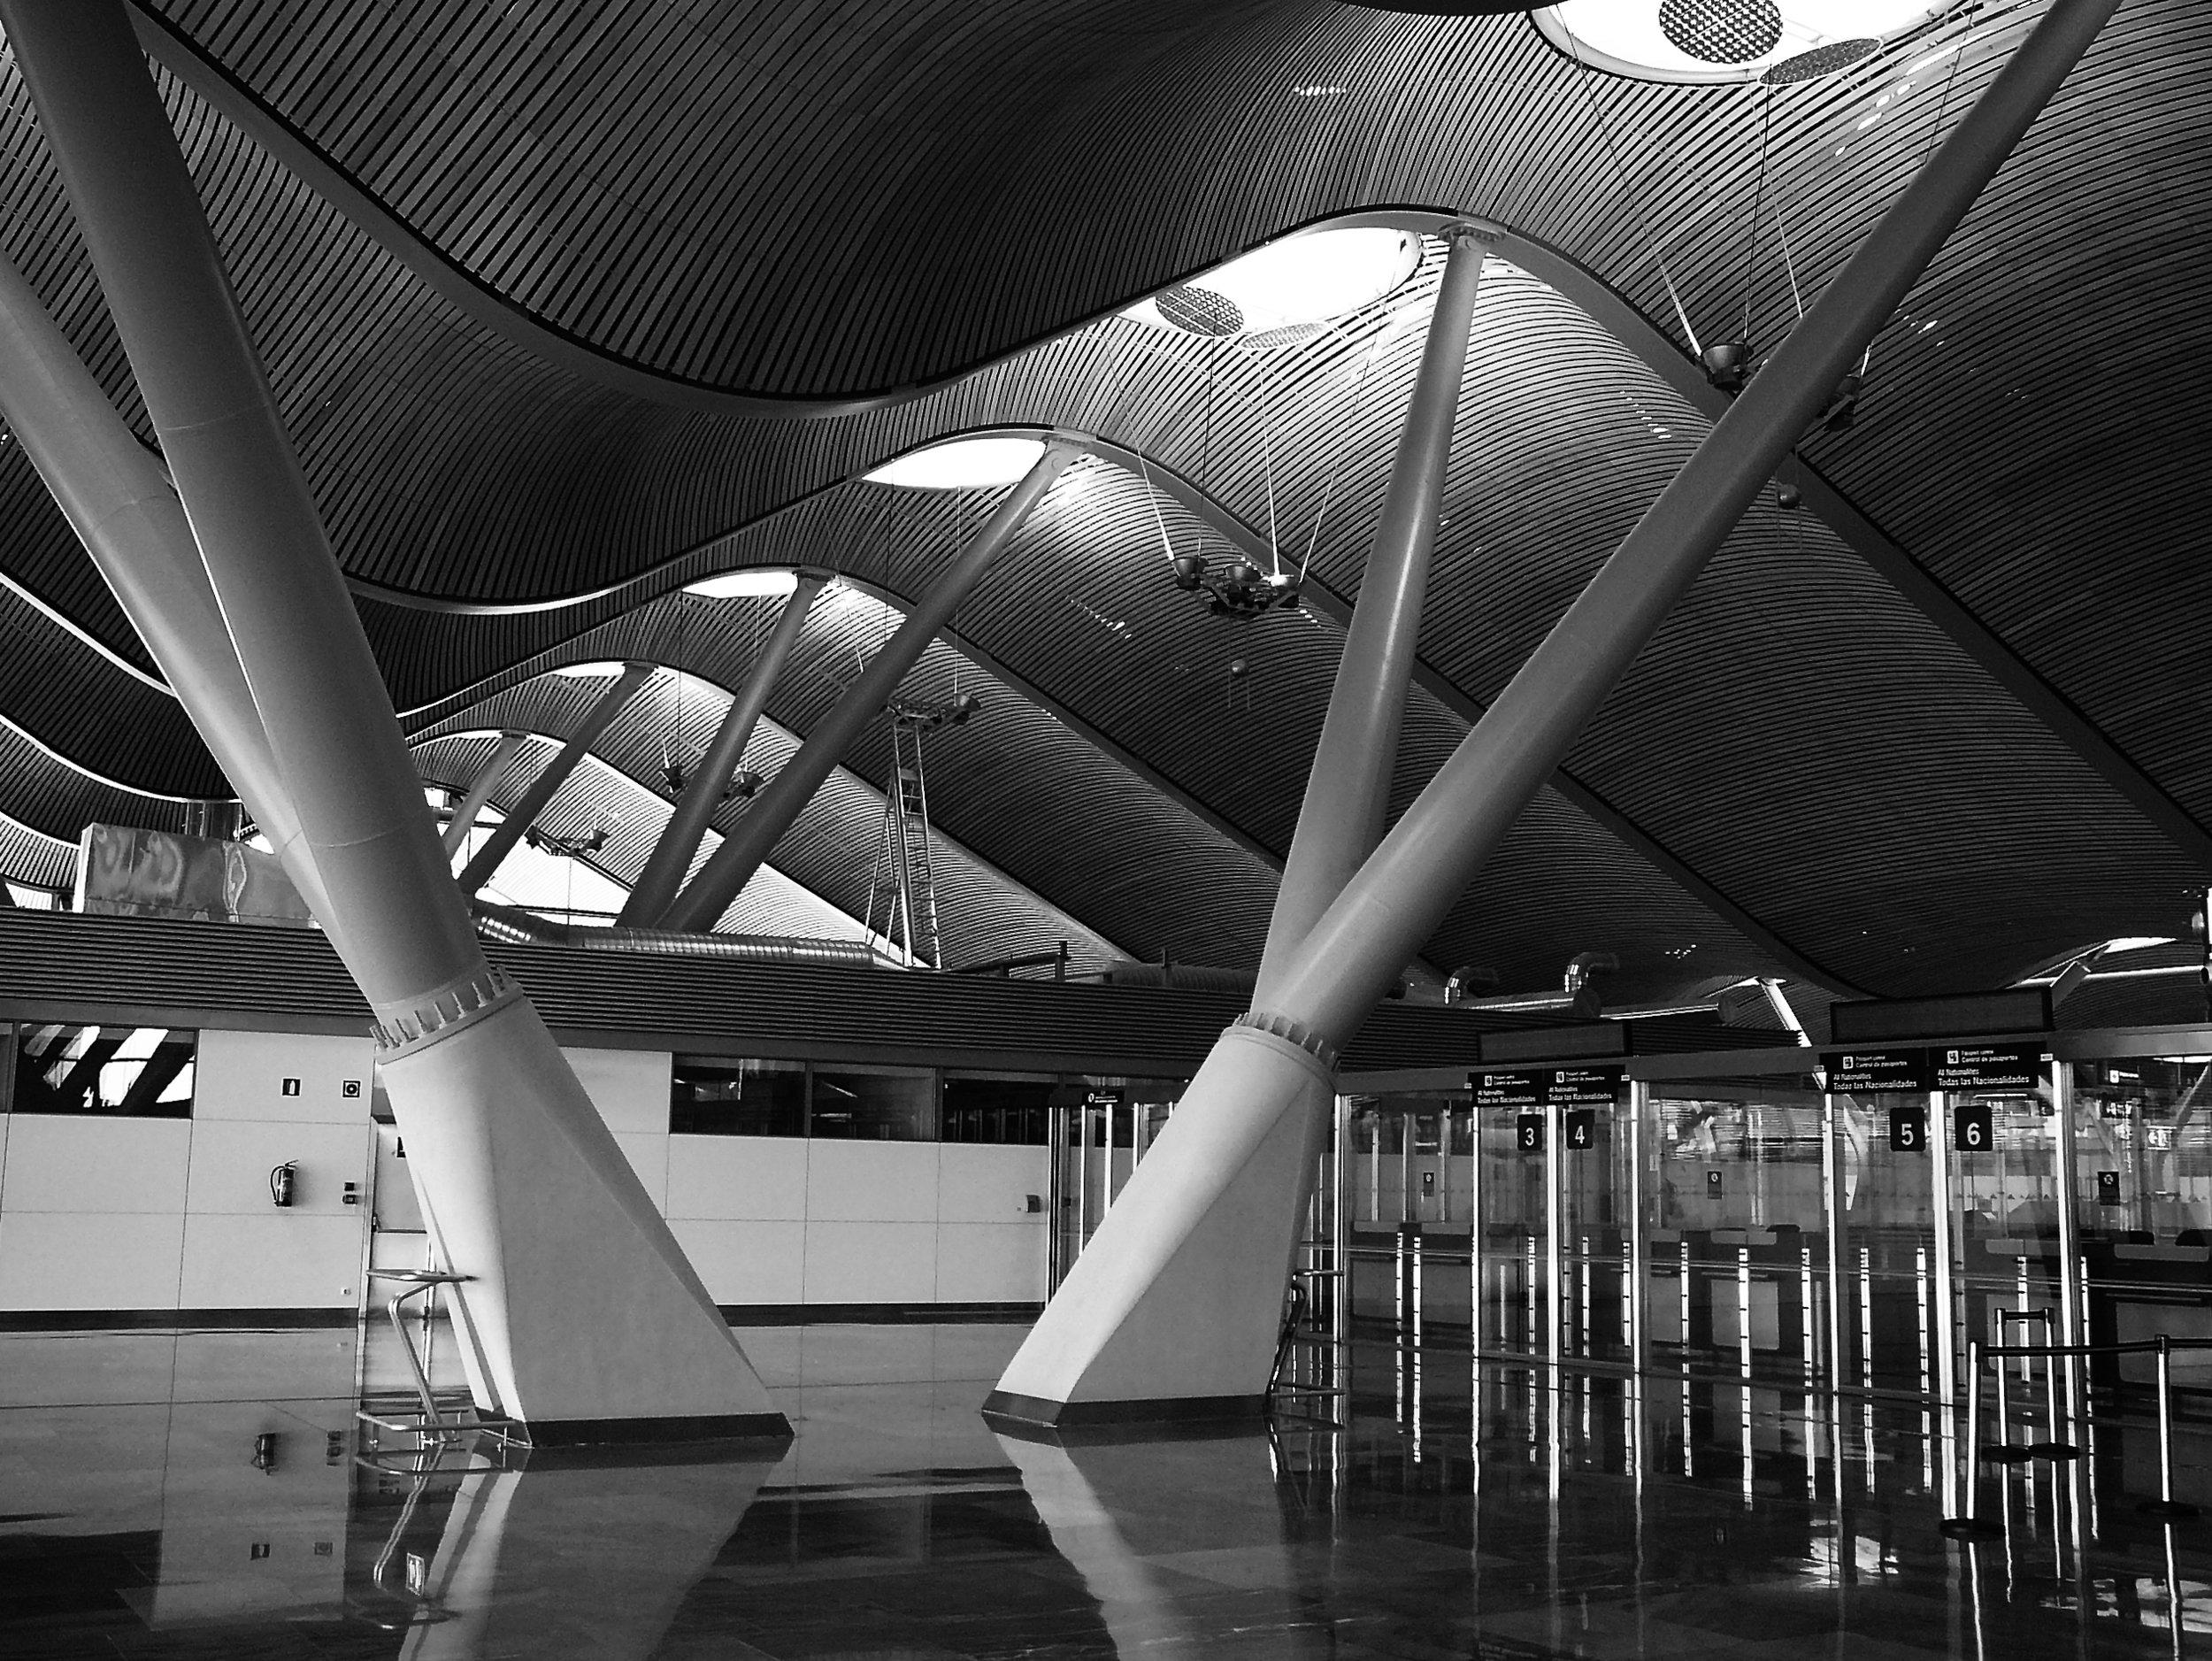 6. Bamboo, limestone, aluminium, steel, glass. Madrid Barajas Airport, Richard Rogers. © Bill Caplan